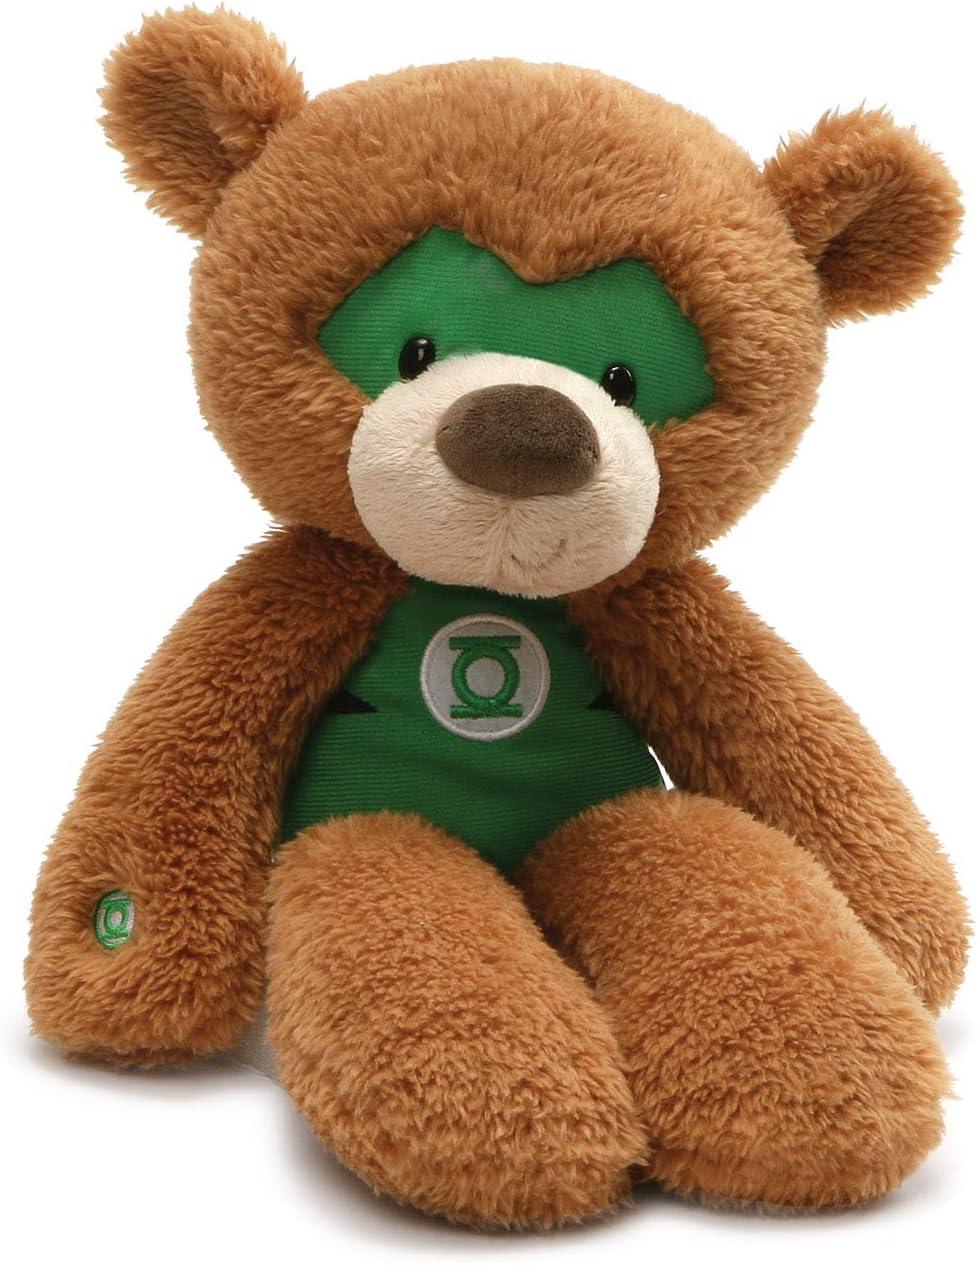 "GUND DC Comics Universe Green Lantern Fuzzy Teddy Bear Stuffed Animal Plush, Brown, 14"""